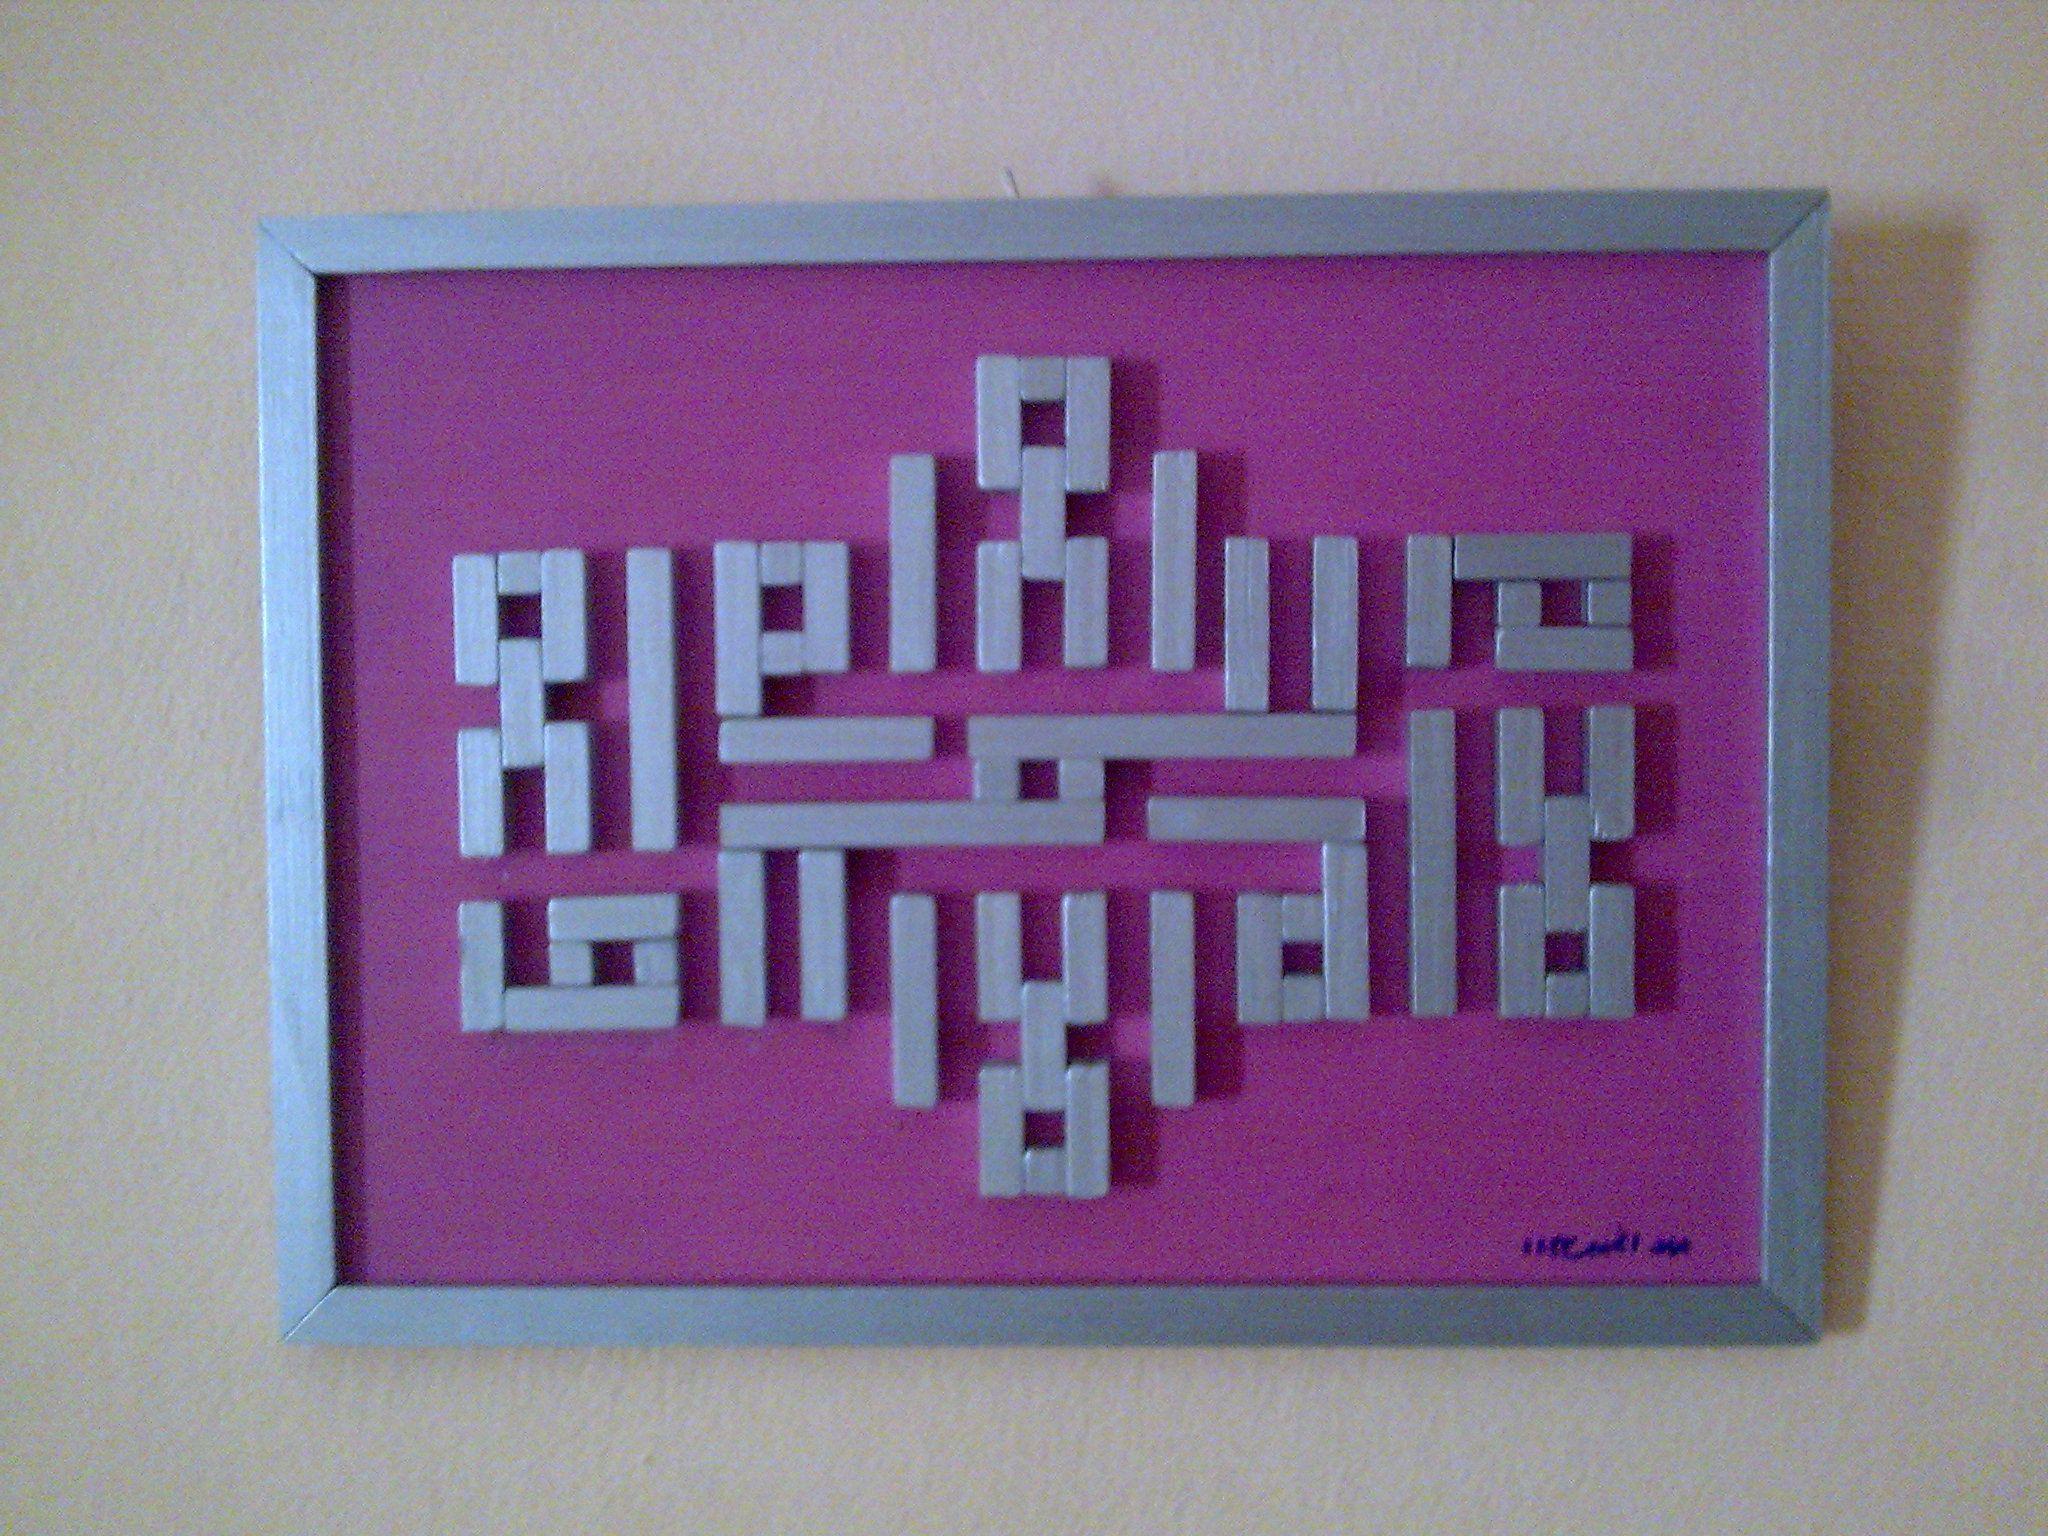 Best kufic square خط بنایی کوفی معقلی images